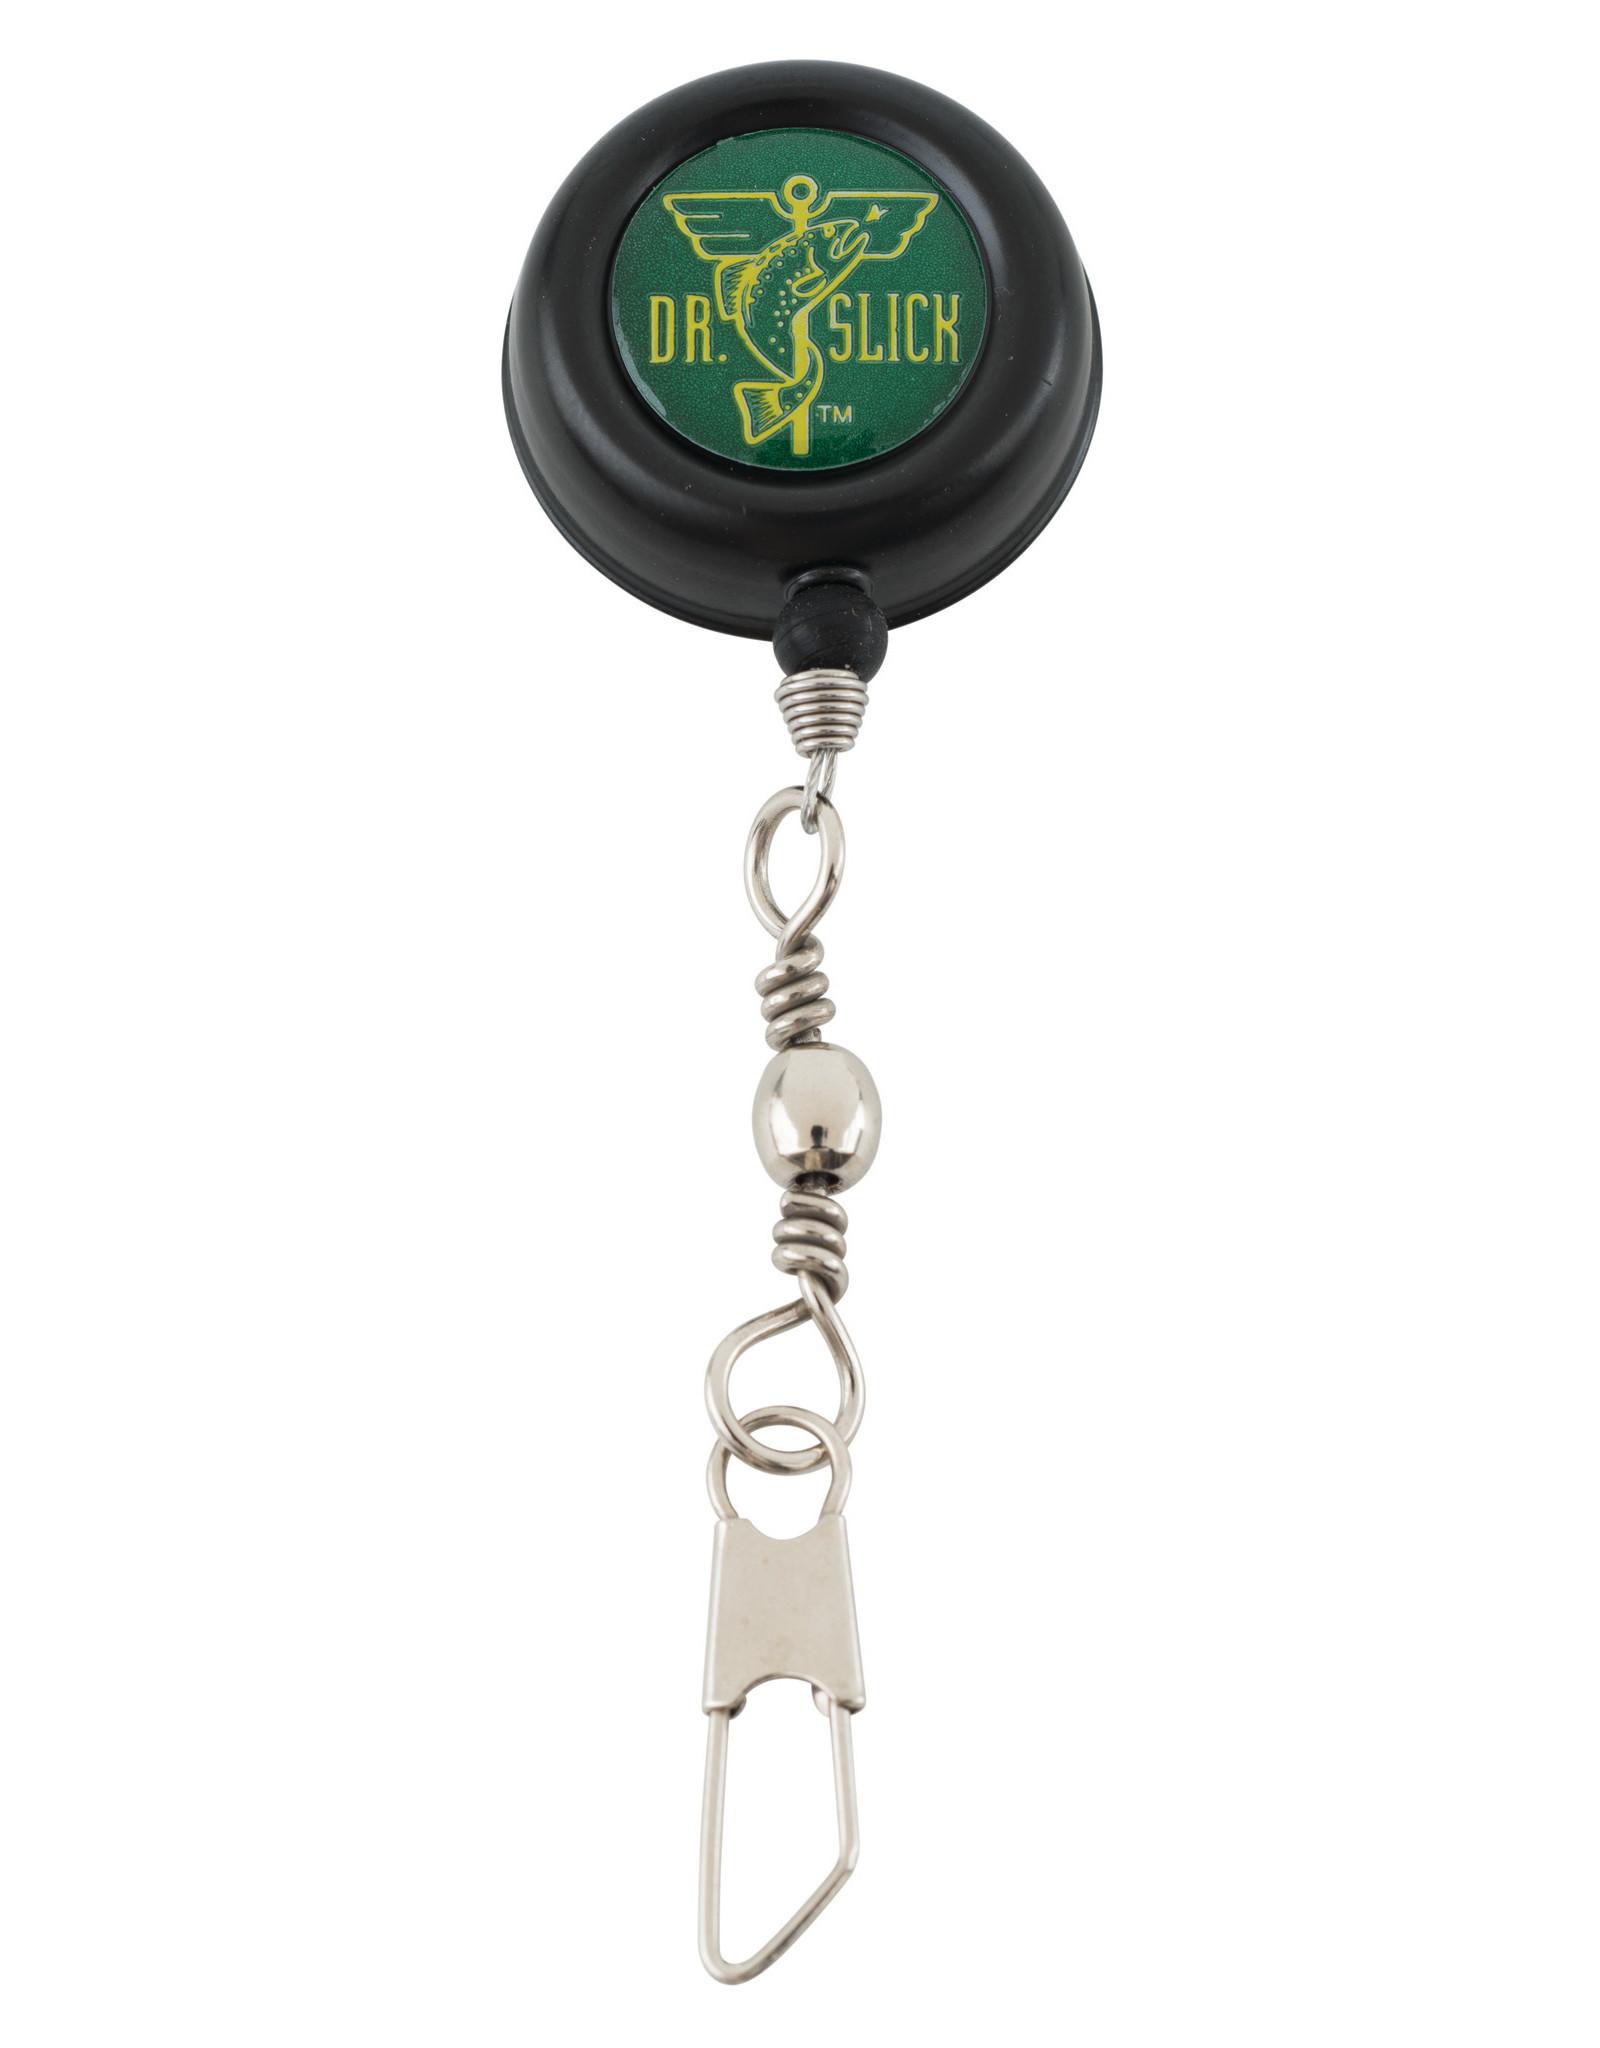 DR. SLICK Dr. Slick Pin-On-Reel, Black, Steel Cord, Swivel Ring